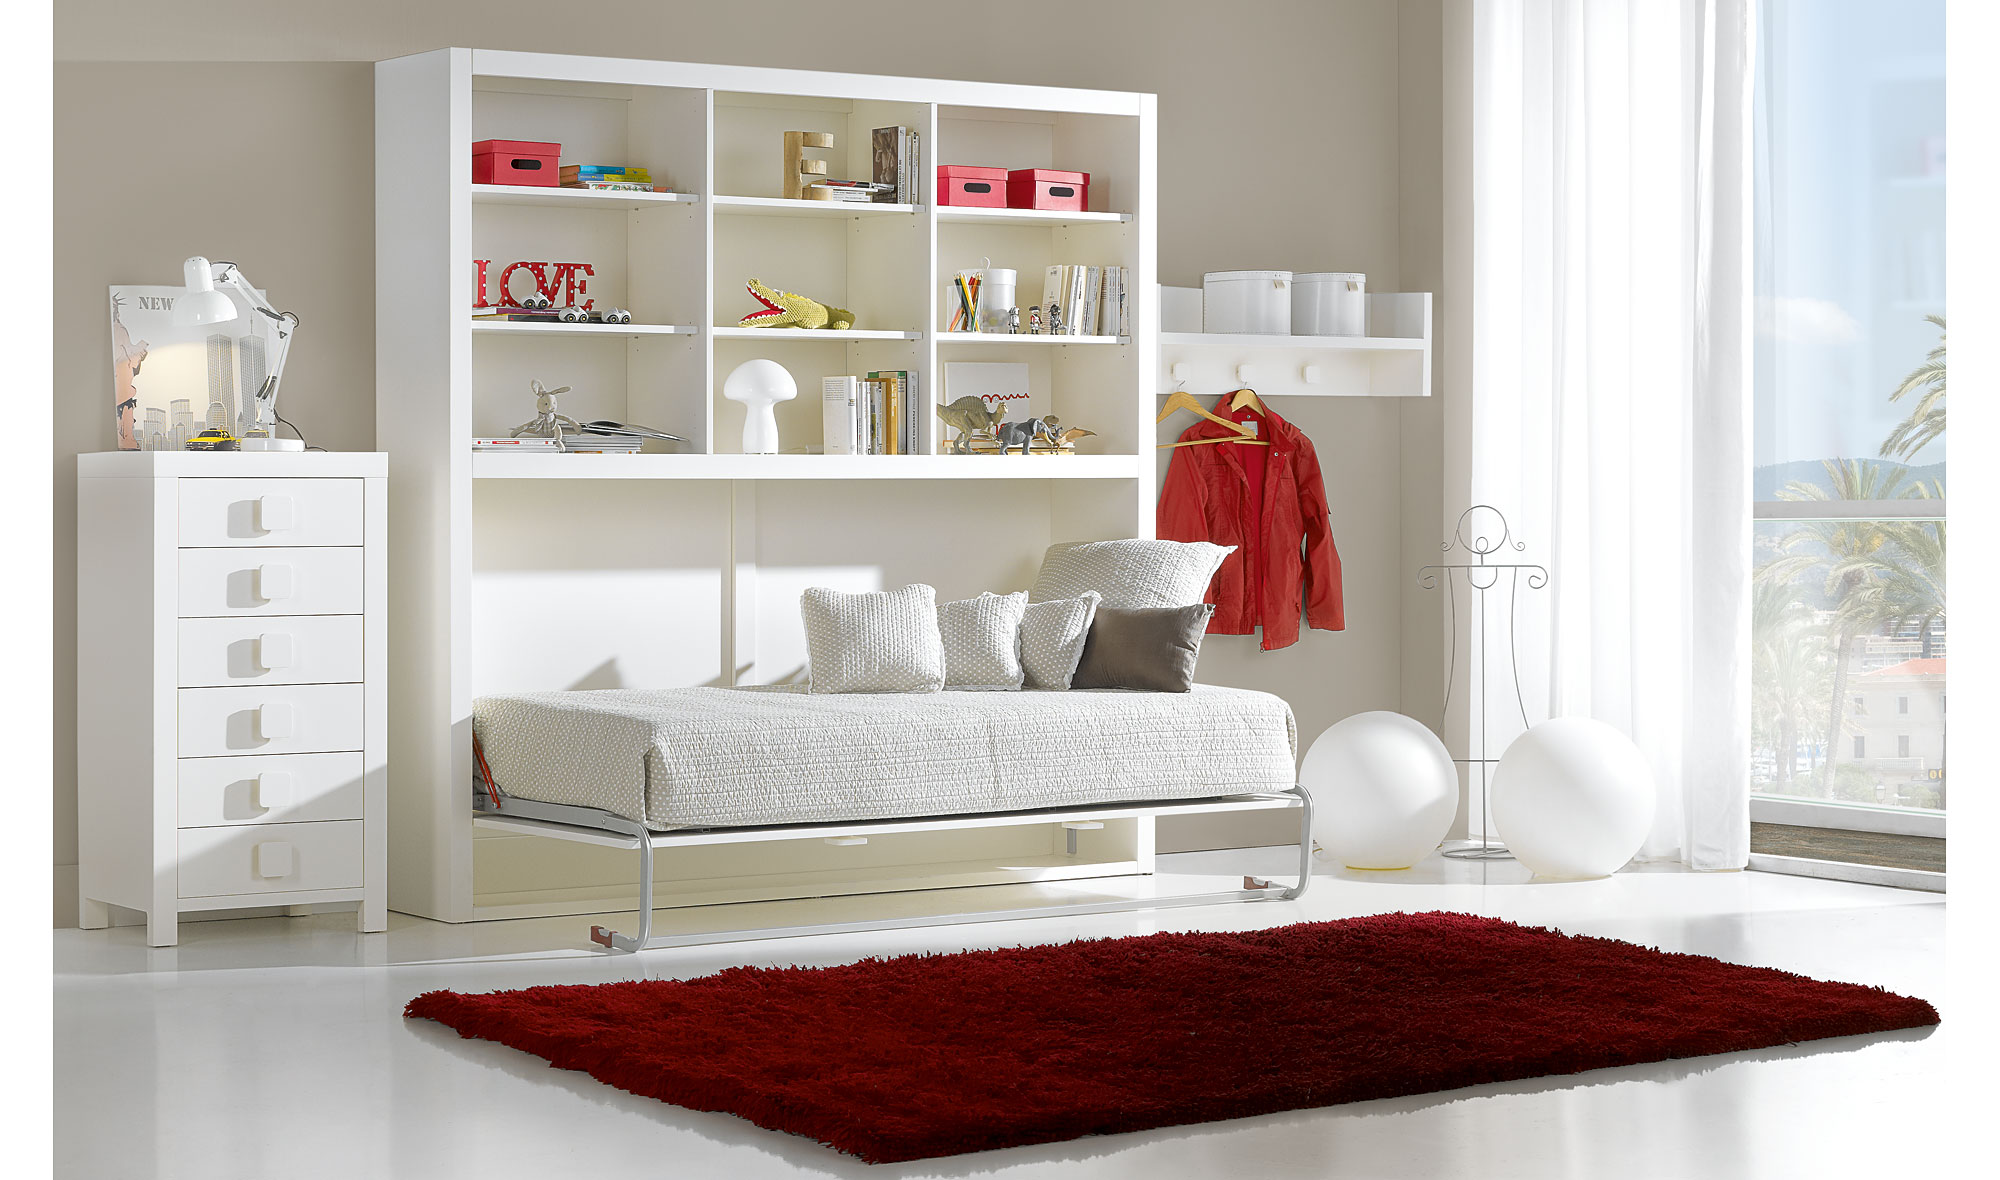 Dormitorio infantil kika viii en tu - Muebles dormitorio infantil ...